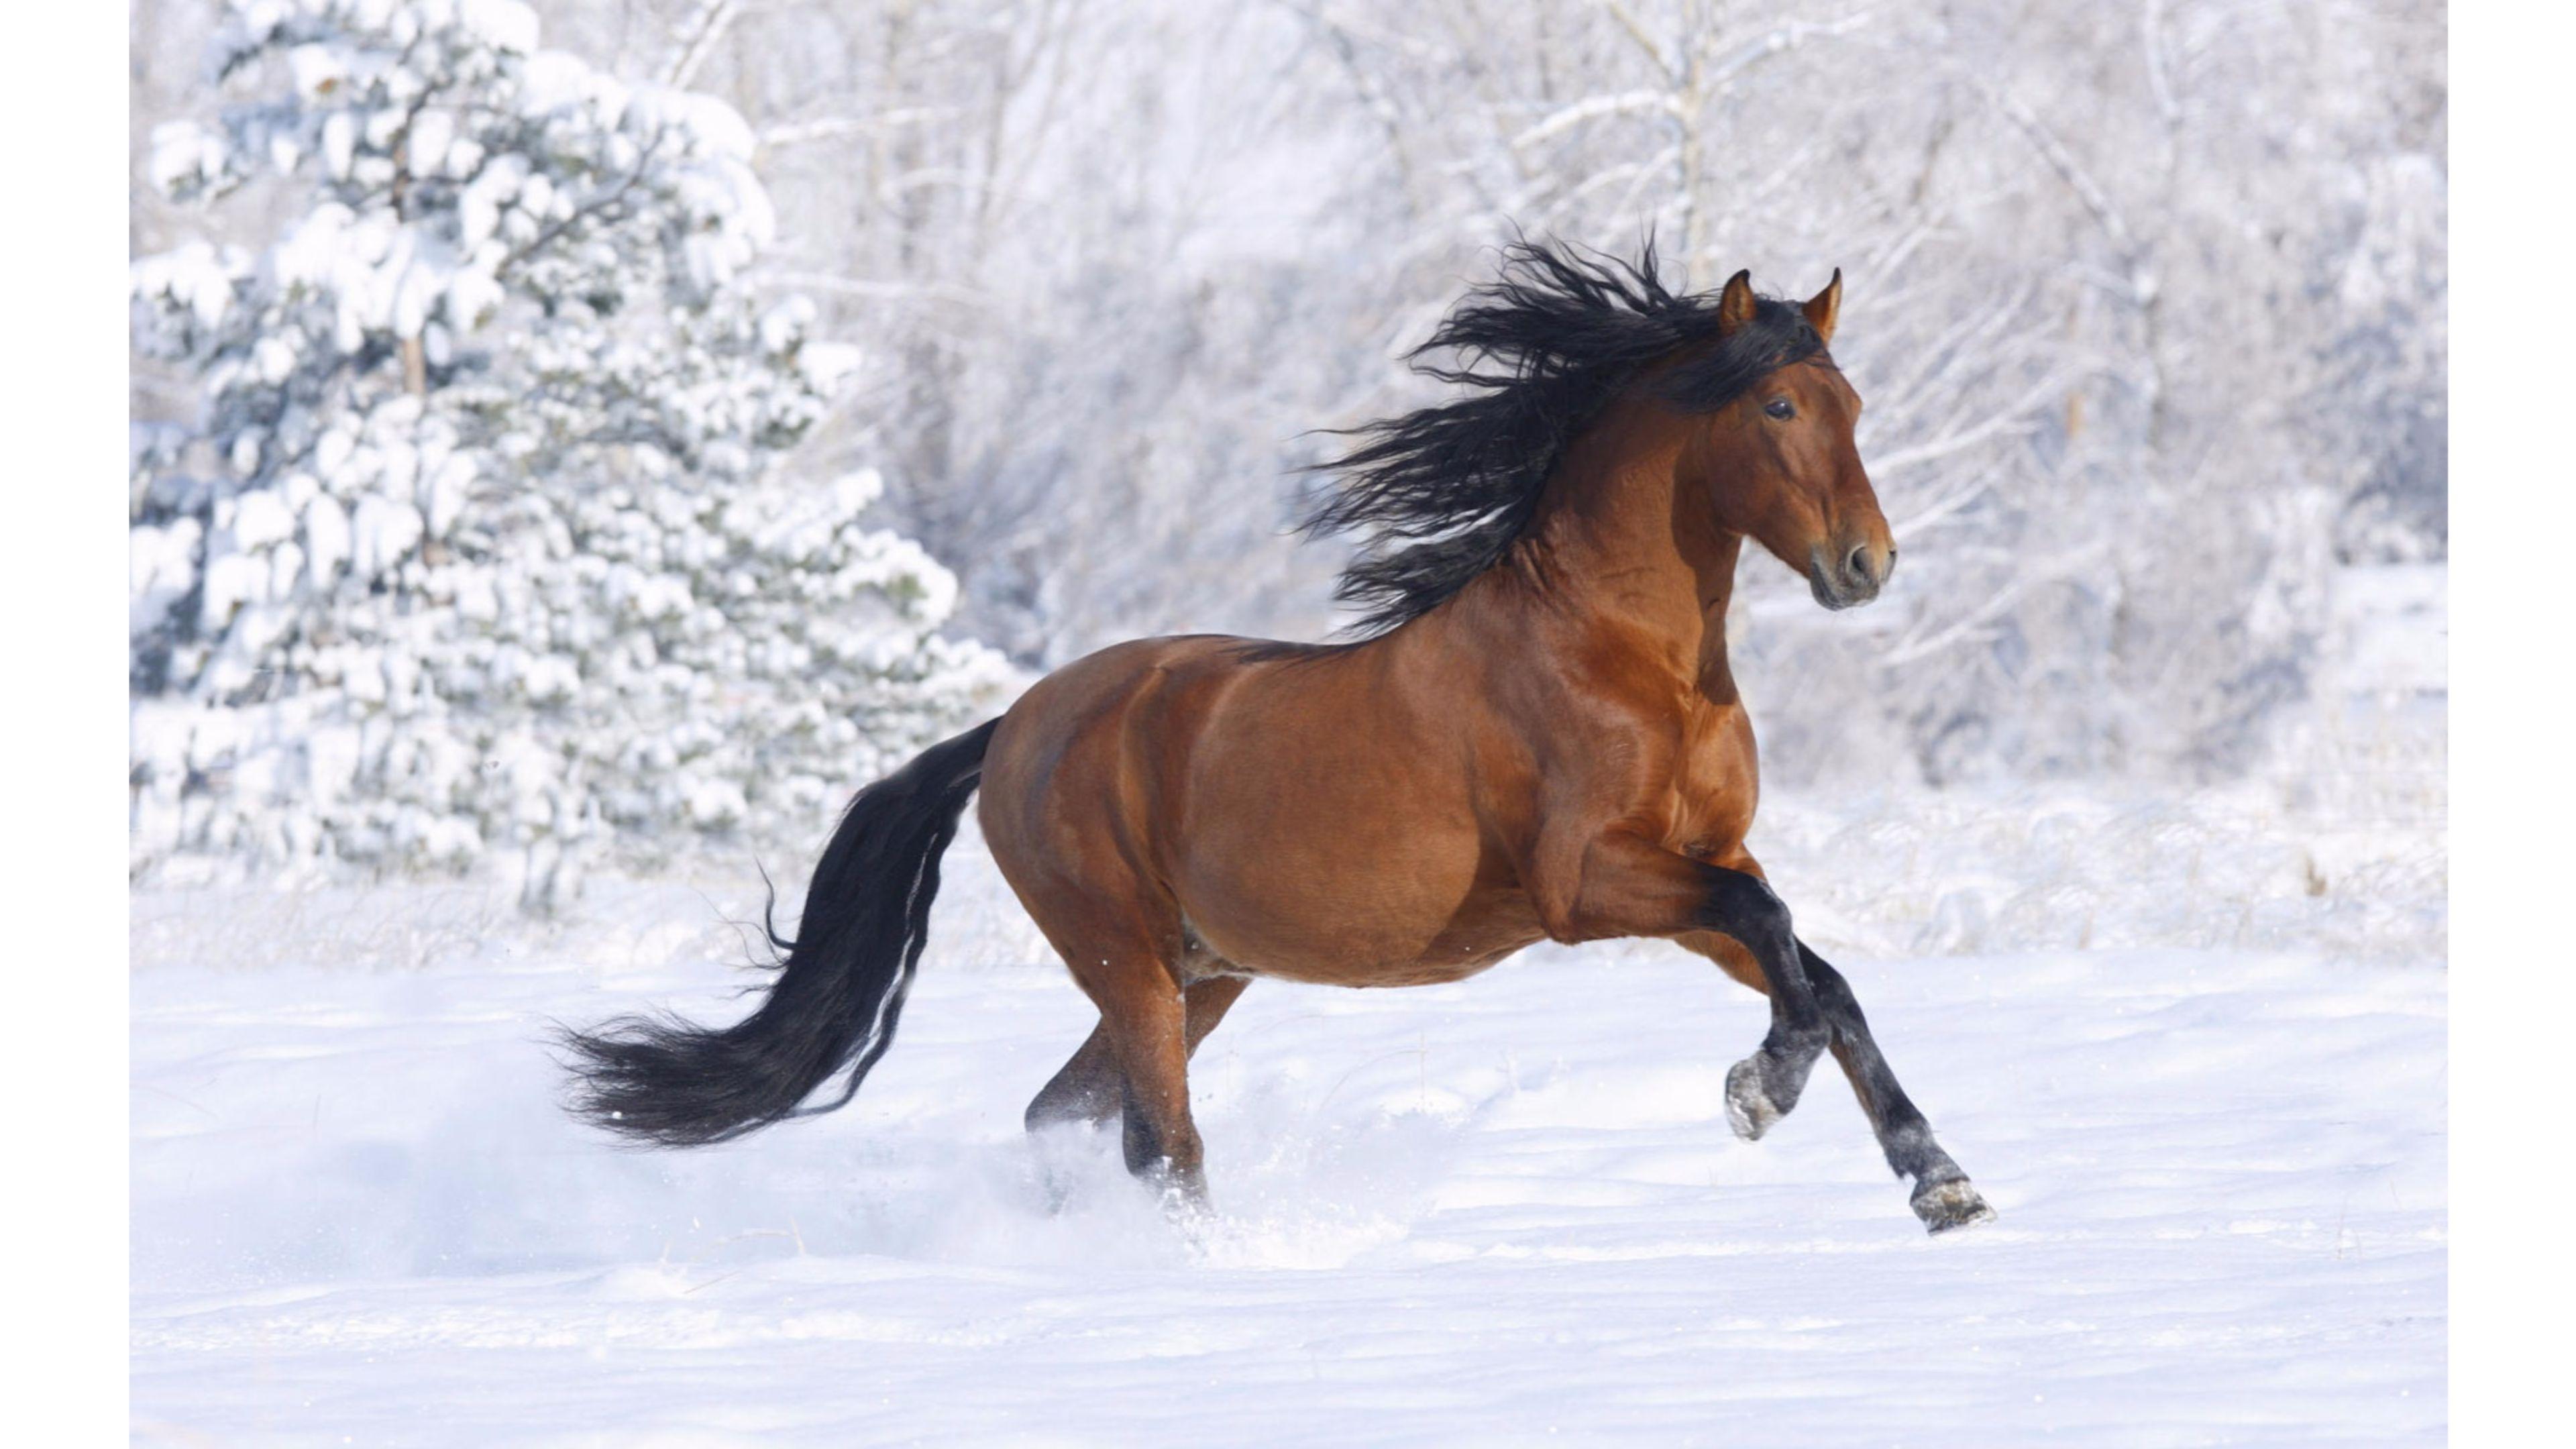 Snow Horses 4K Wallpaper   Free 4K Wallpaper